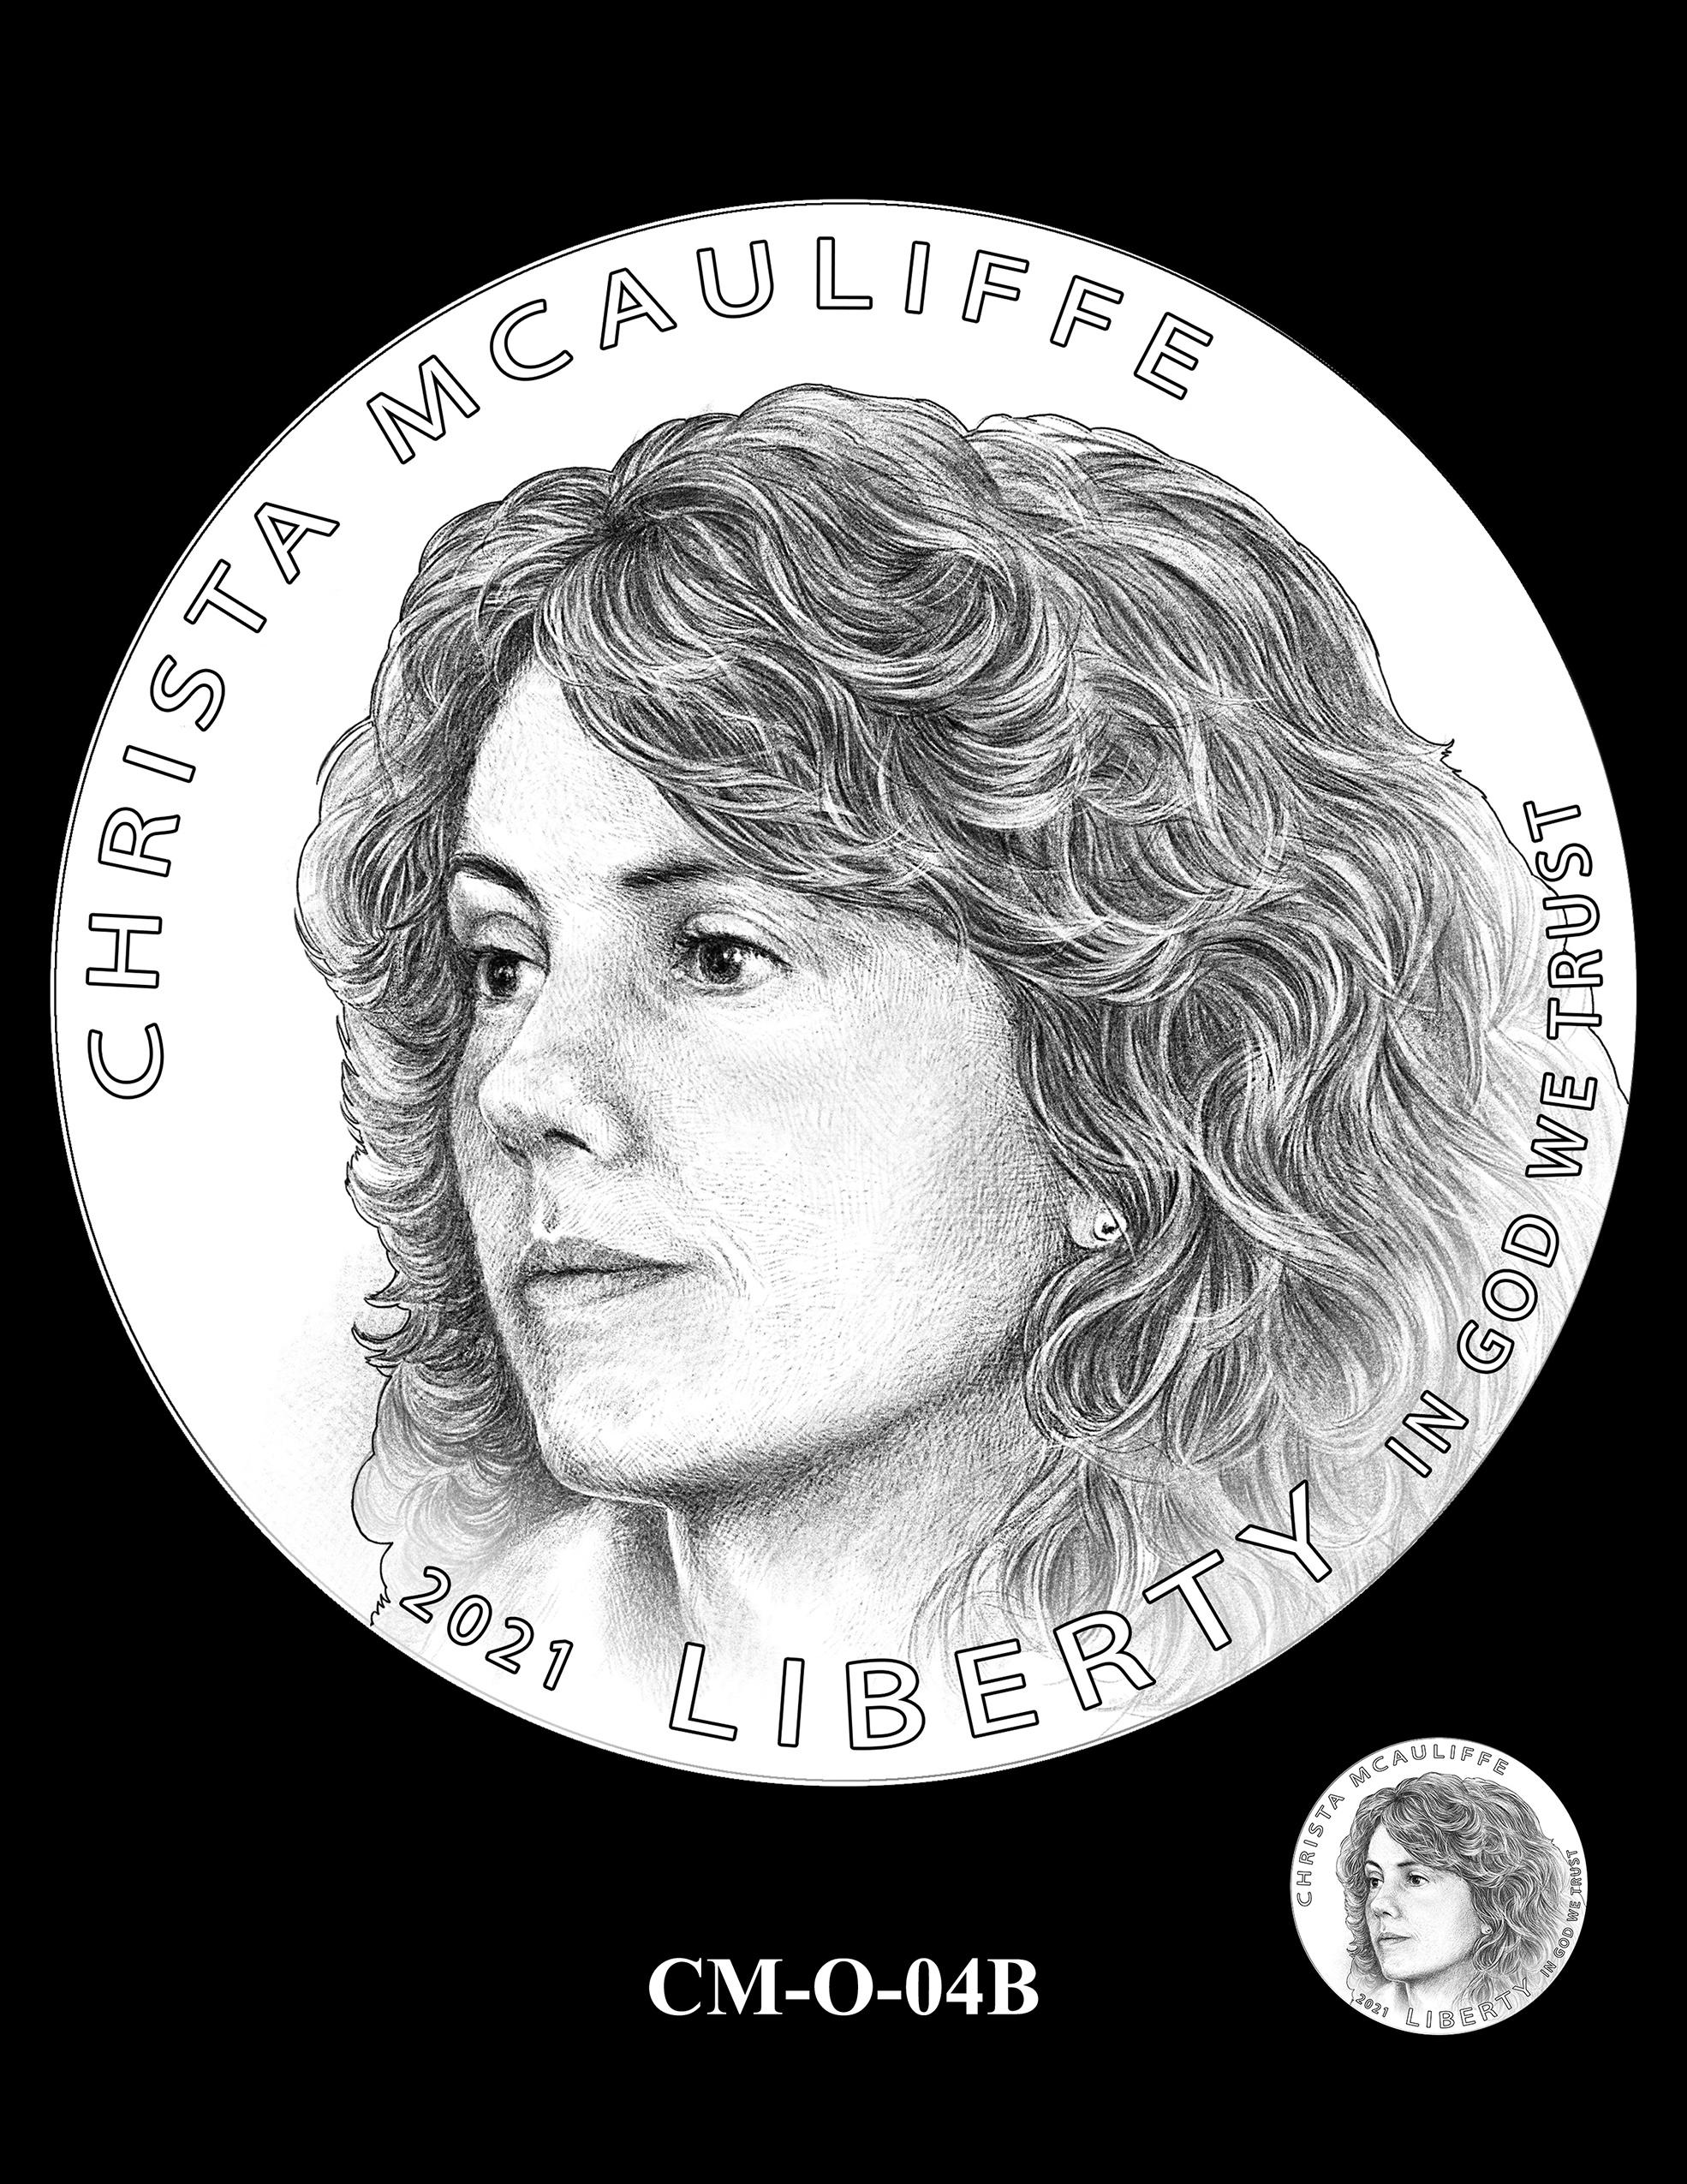 CM-O-04B -- 2021 Christa McAuliffe Commemorative Coin